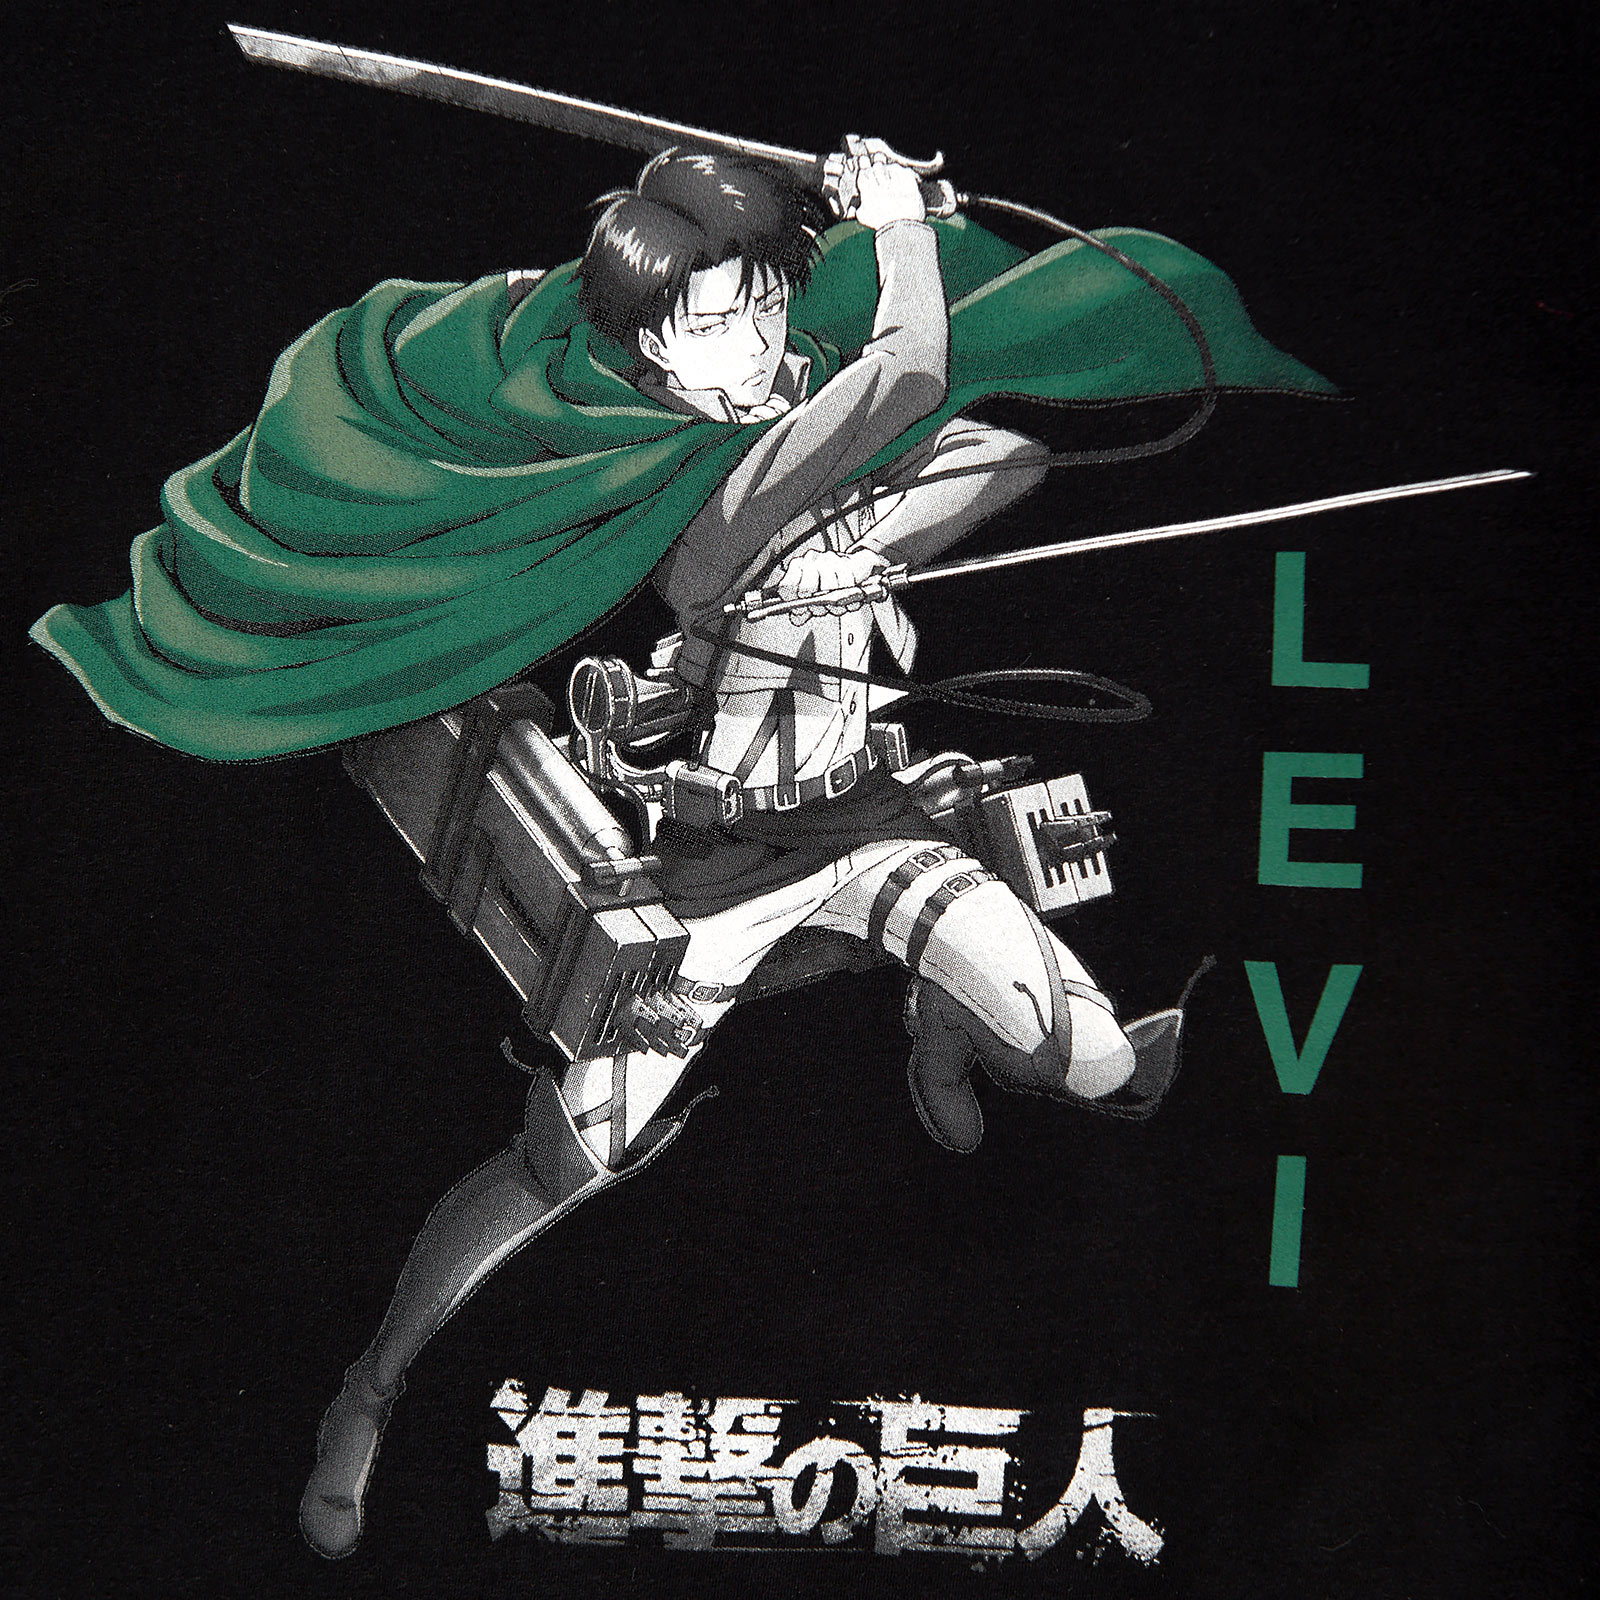 Attack on Titan - Levi T-Shirt